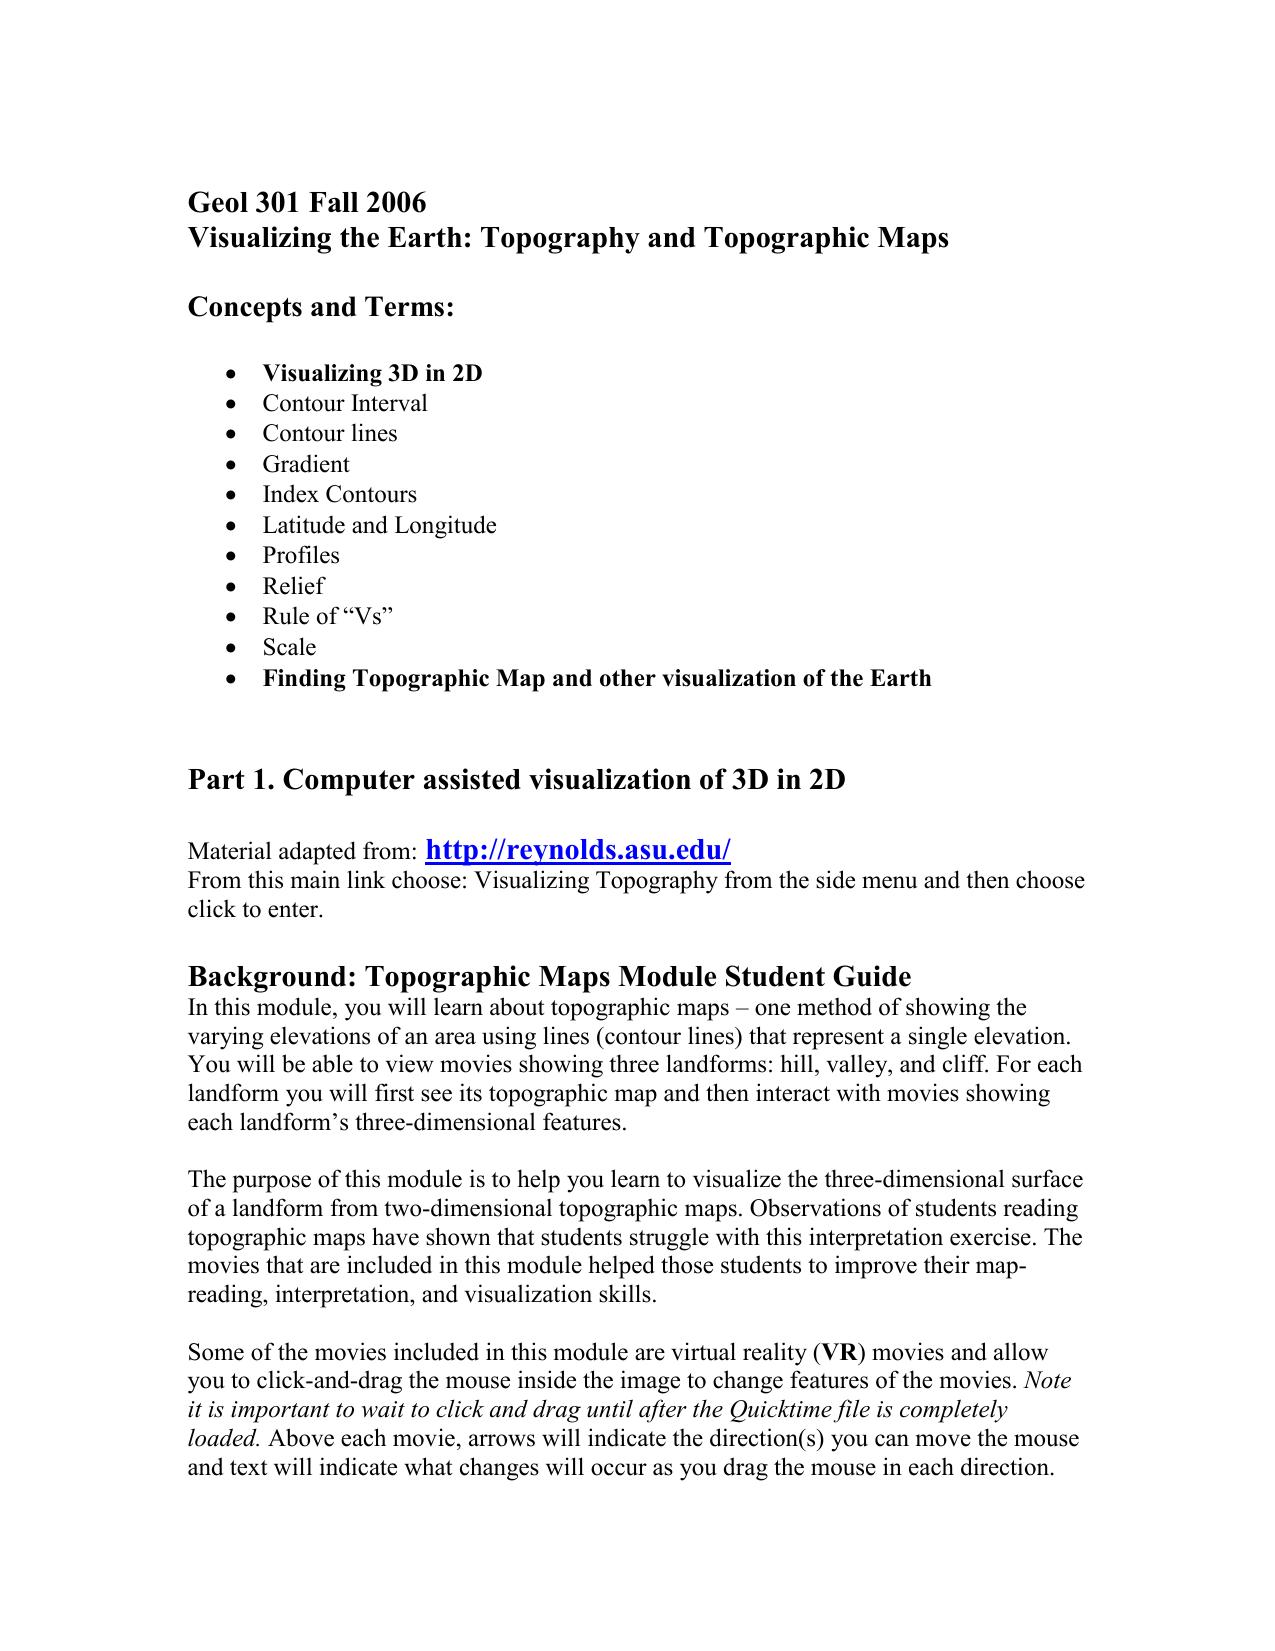 Topographic Maps Module Student Guide